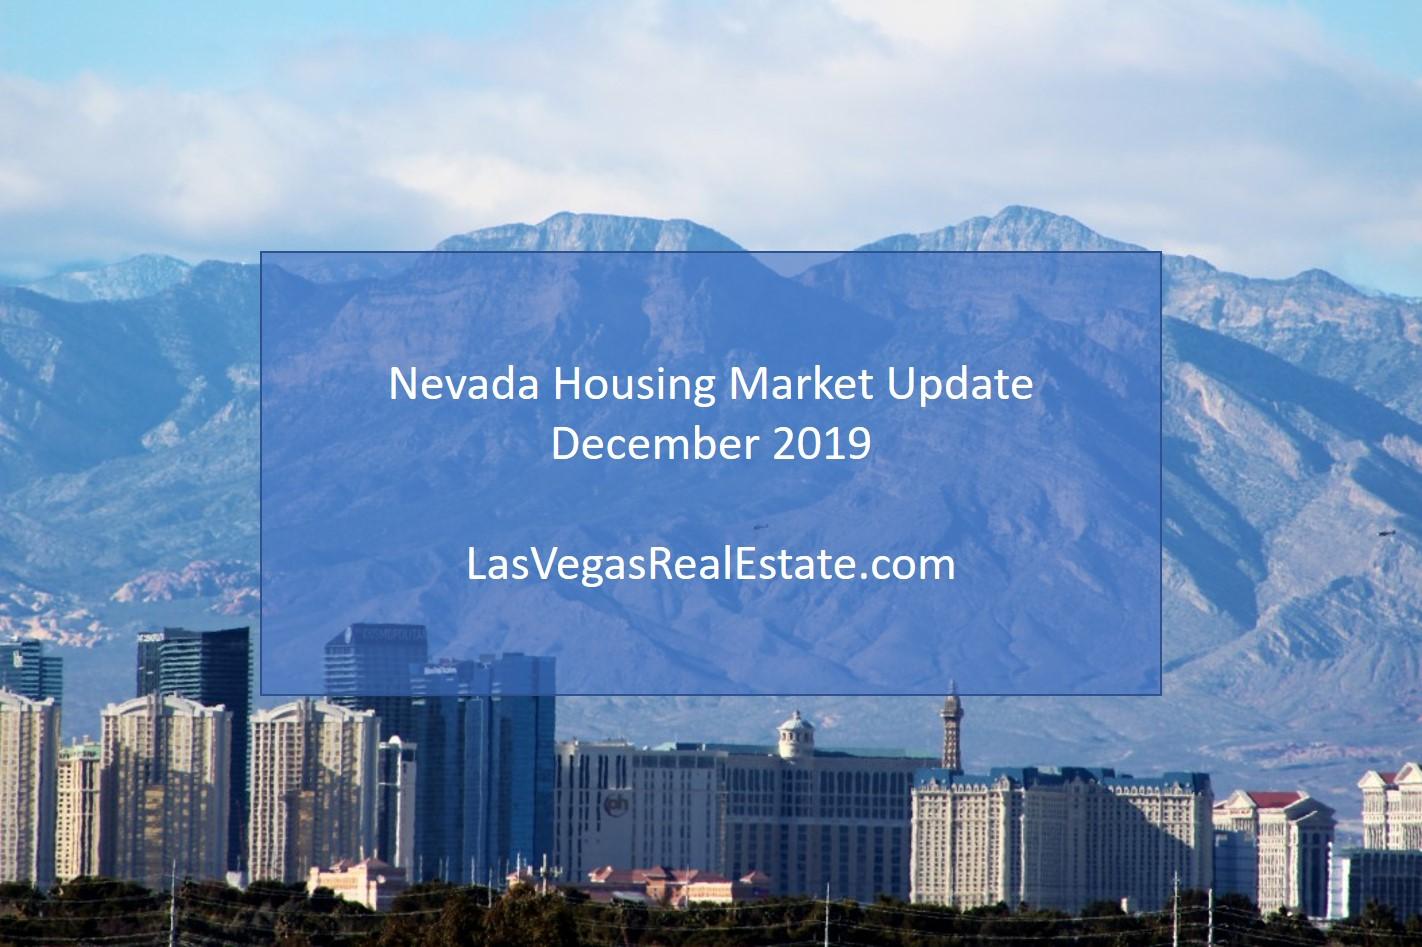 Nevada Housing Market Update - December 2019 - LasVegasRealEstate.com